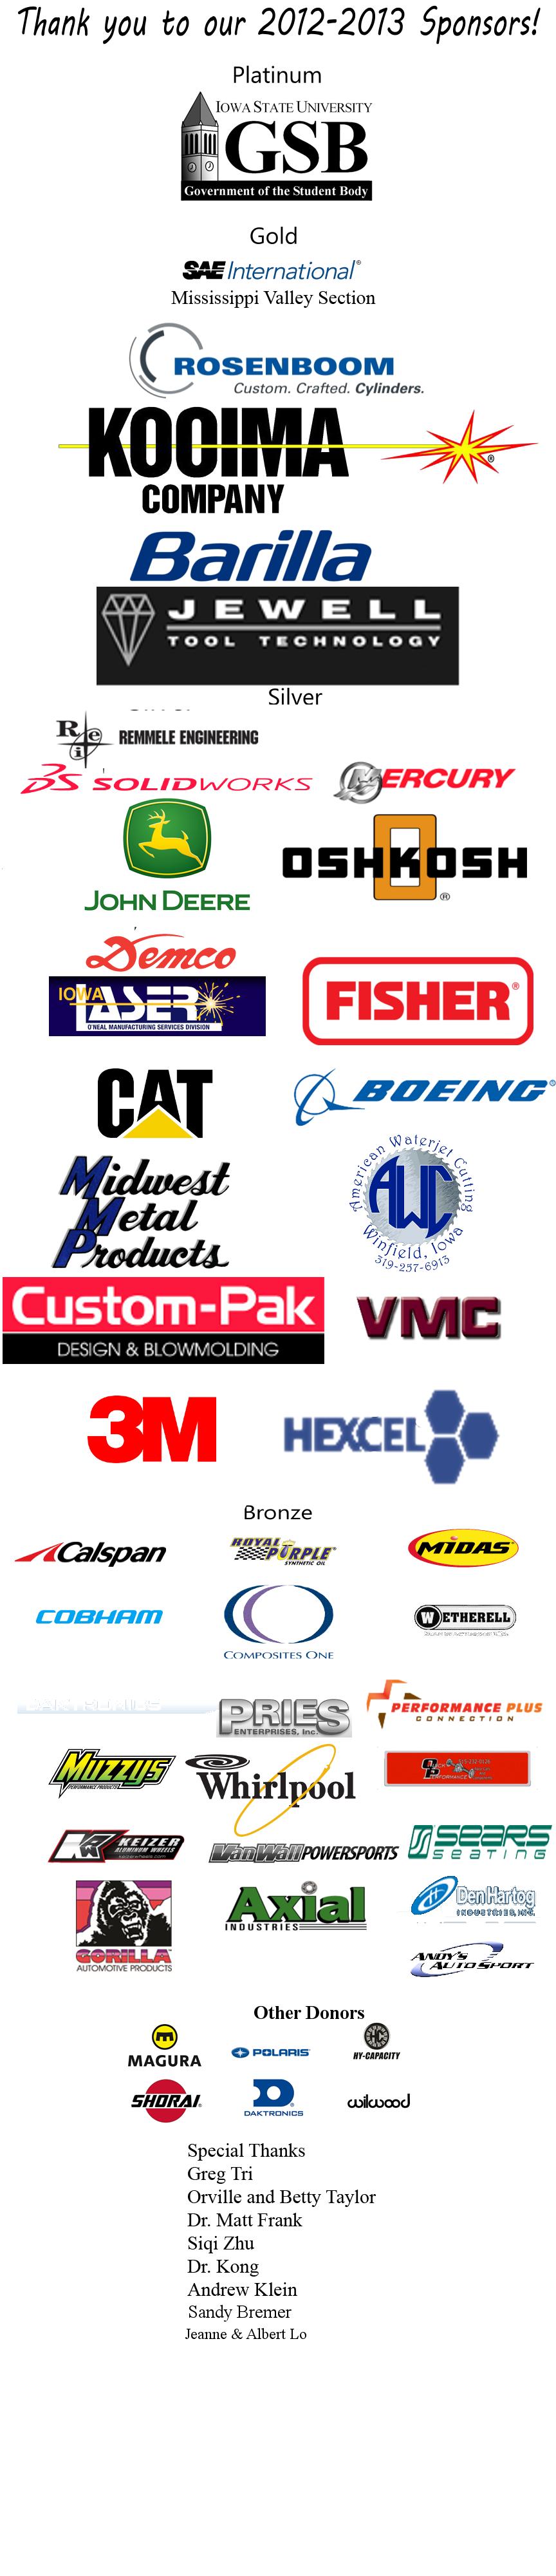 2012-2013 Sponsors